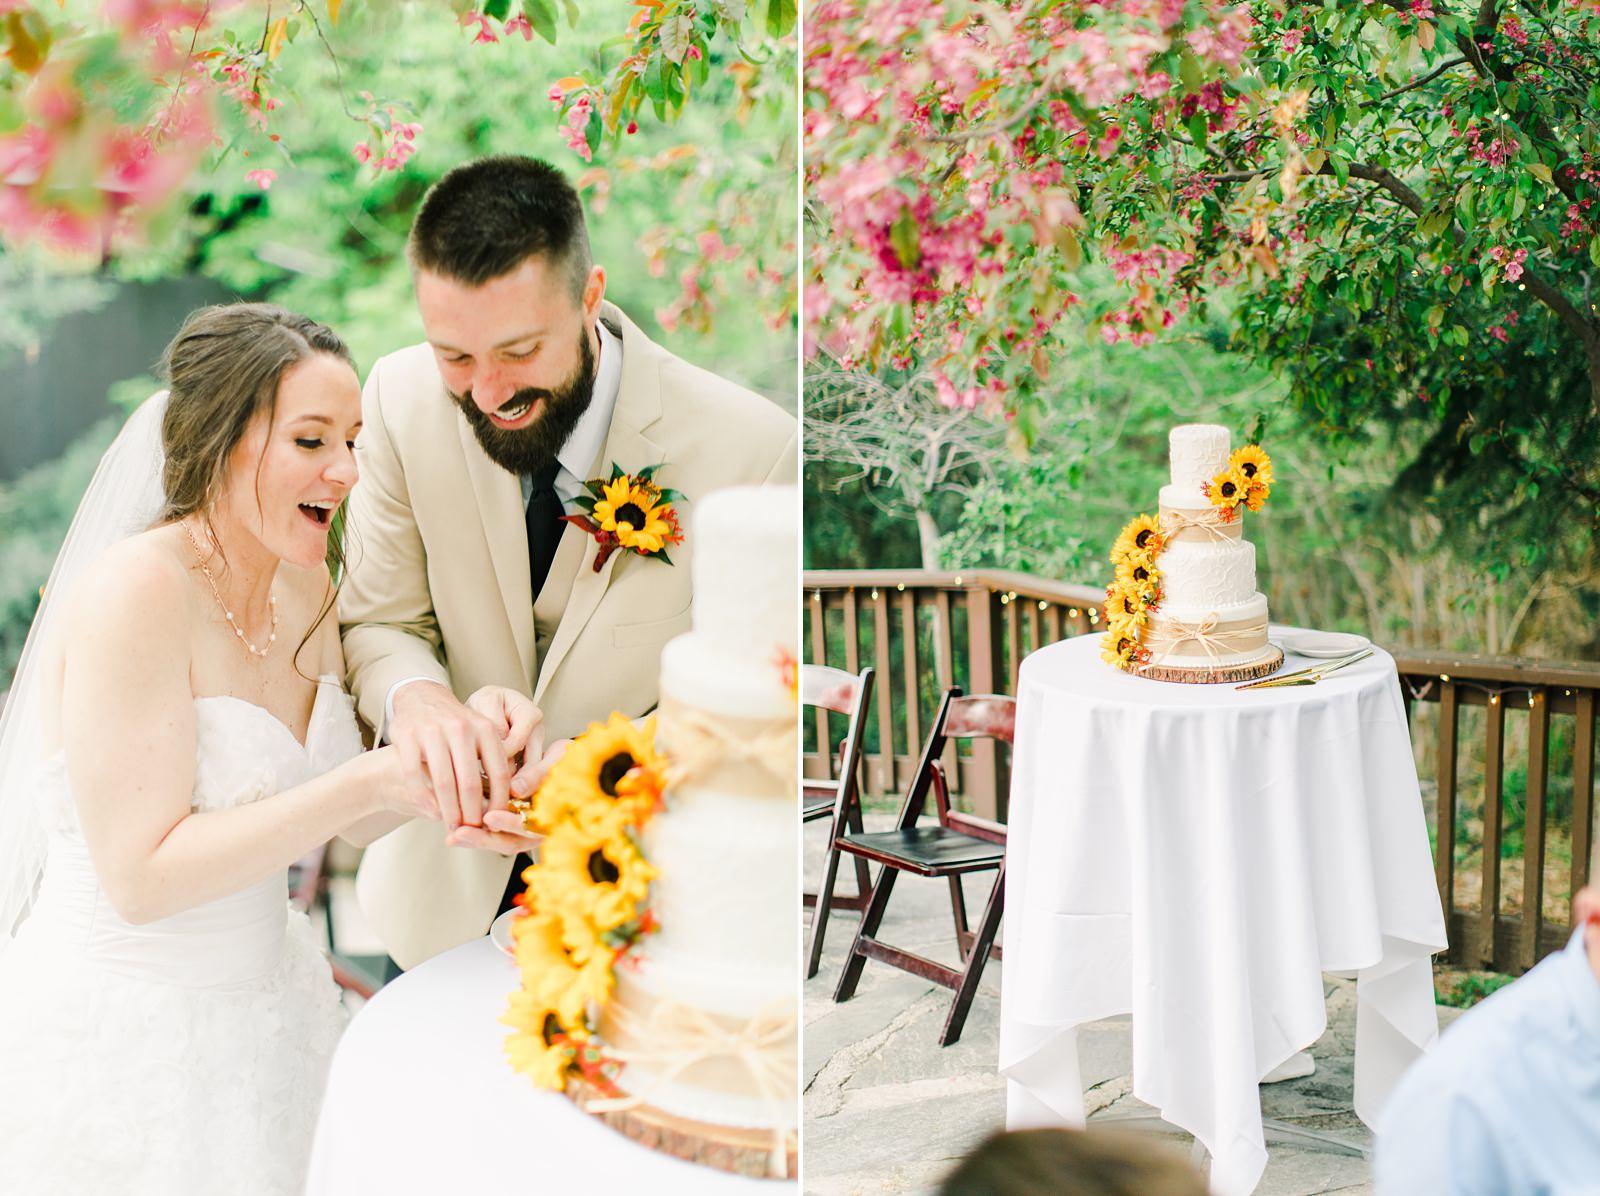 Millcreek Inn Summer Wedding, Utah wedding photography Millcreek Canyon, Salt Lake City, bride and groom cutting cake